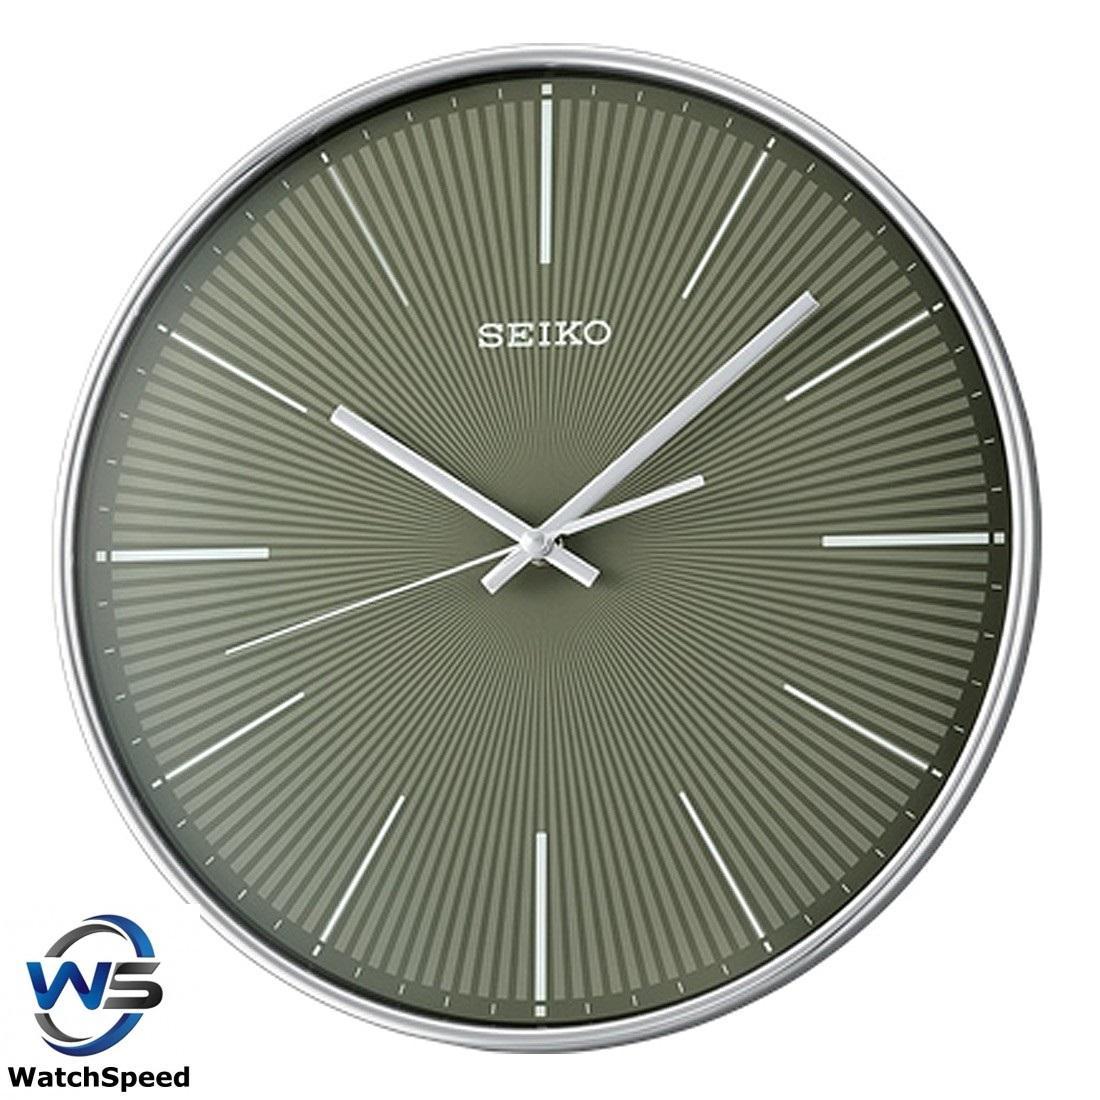 Seiko QXA733AN QXA733A Analog Charcoal Dial Wall Clock